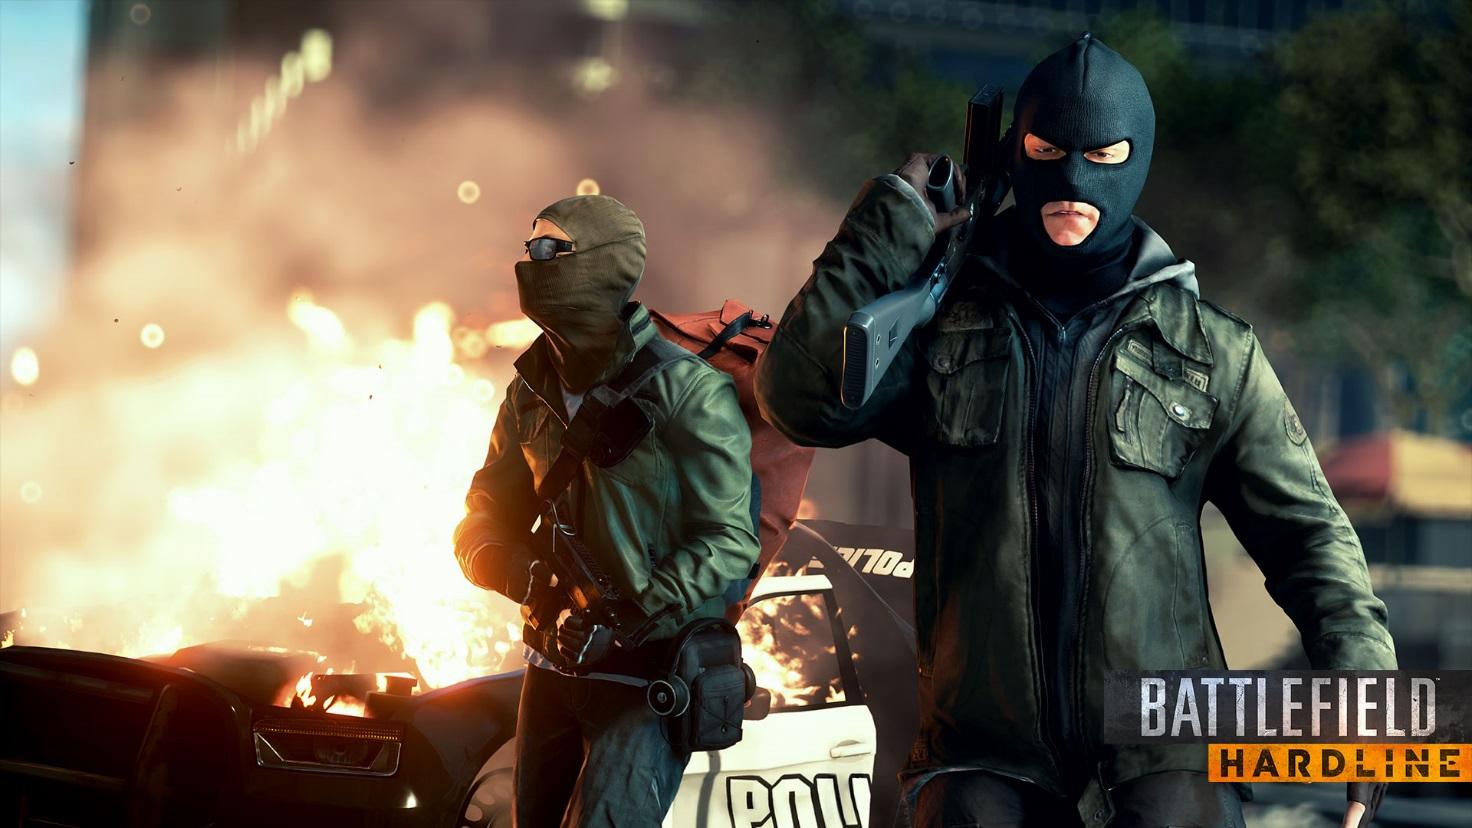 Картинки по запросу Battlefield: Hardline